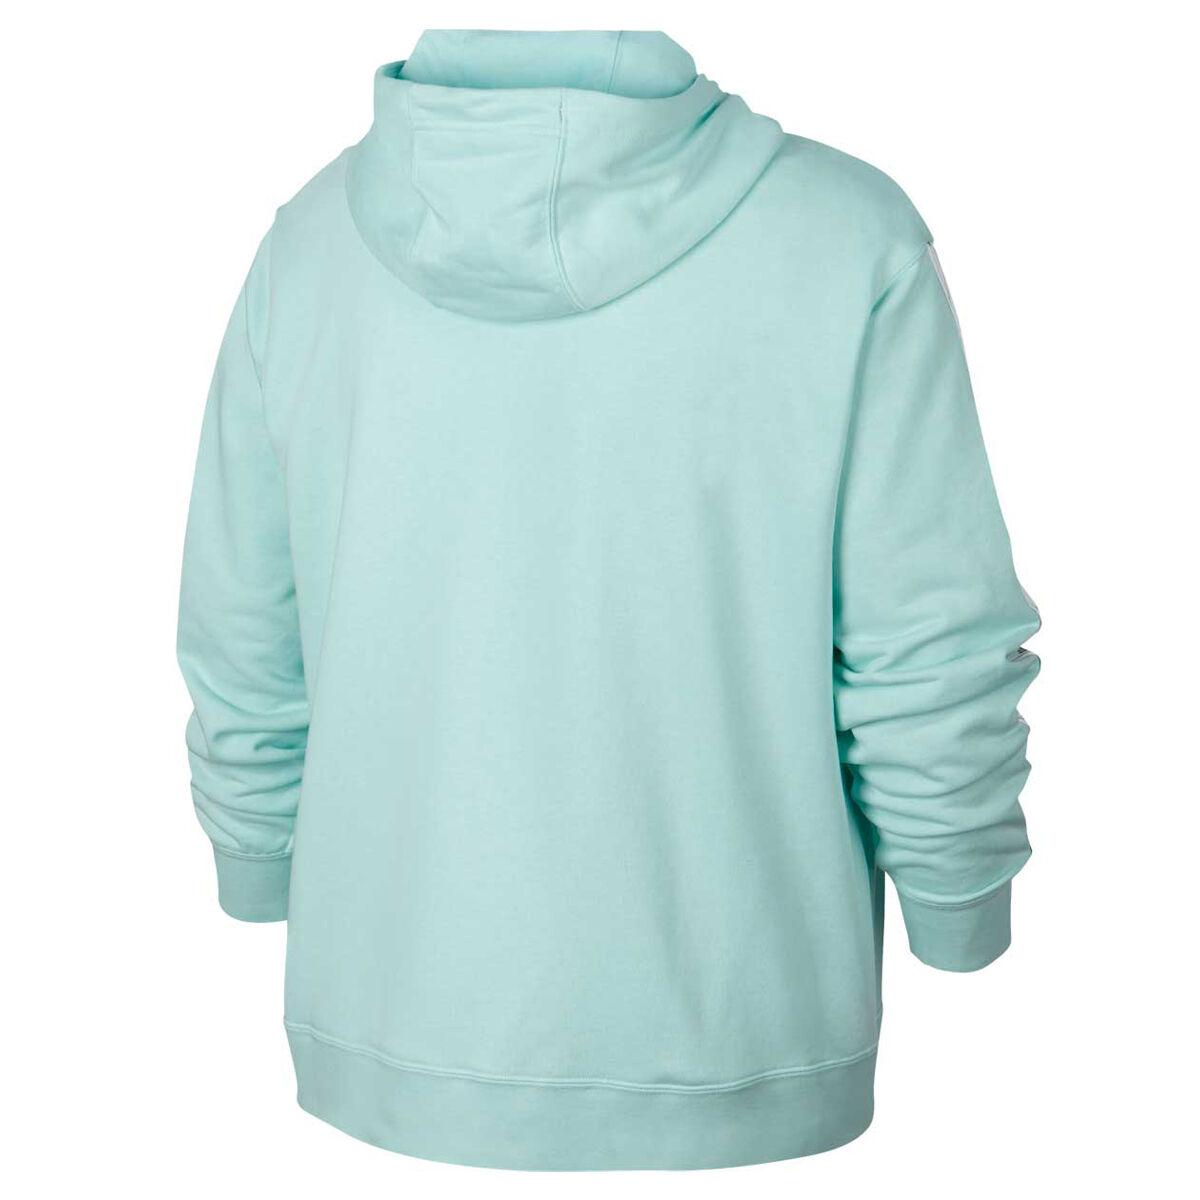 NIKE Women's Sweatshirt Zip Up Grey Teal Size XL